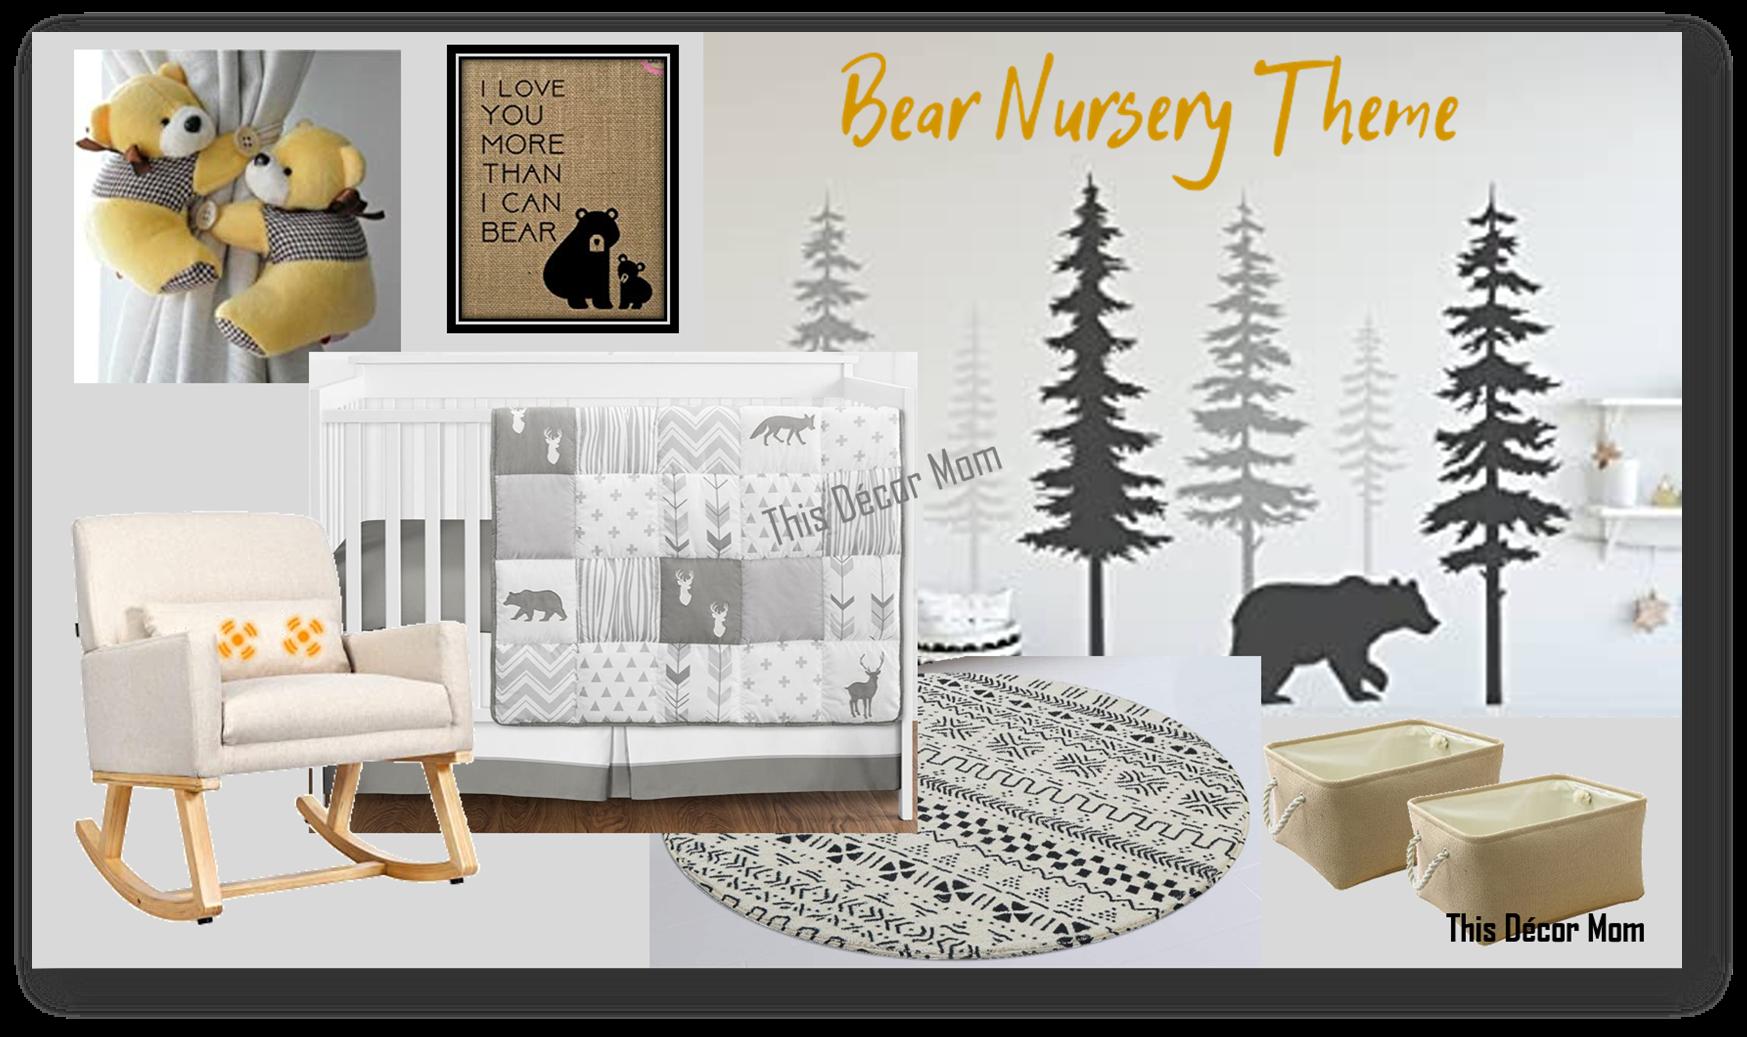 Bear Nursery Theme - Vision Board 1